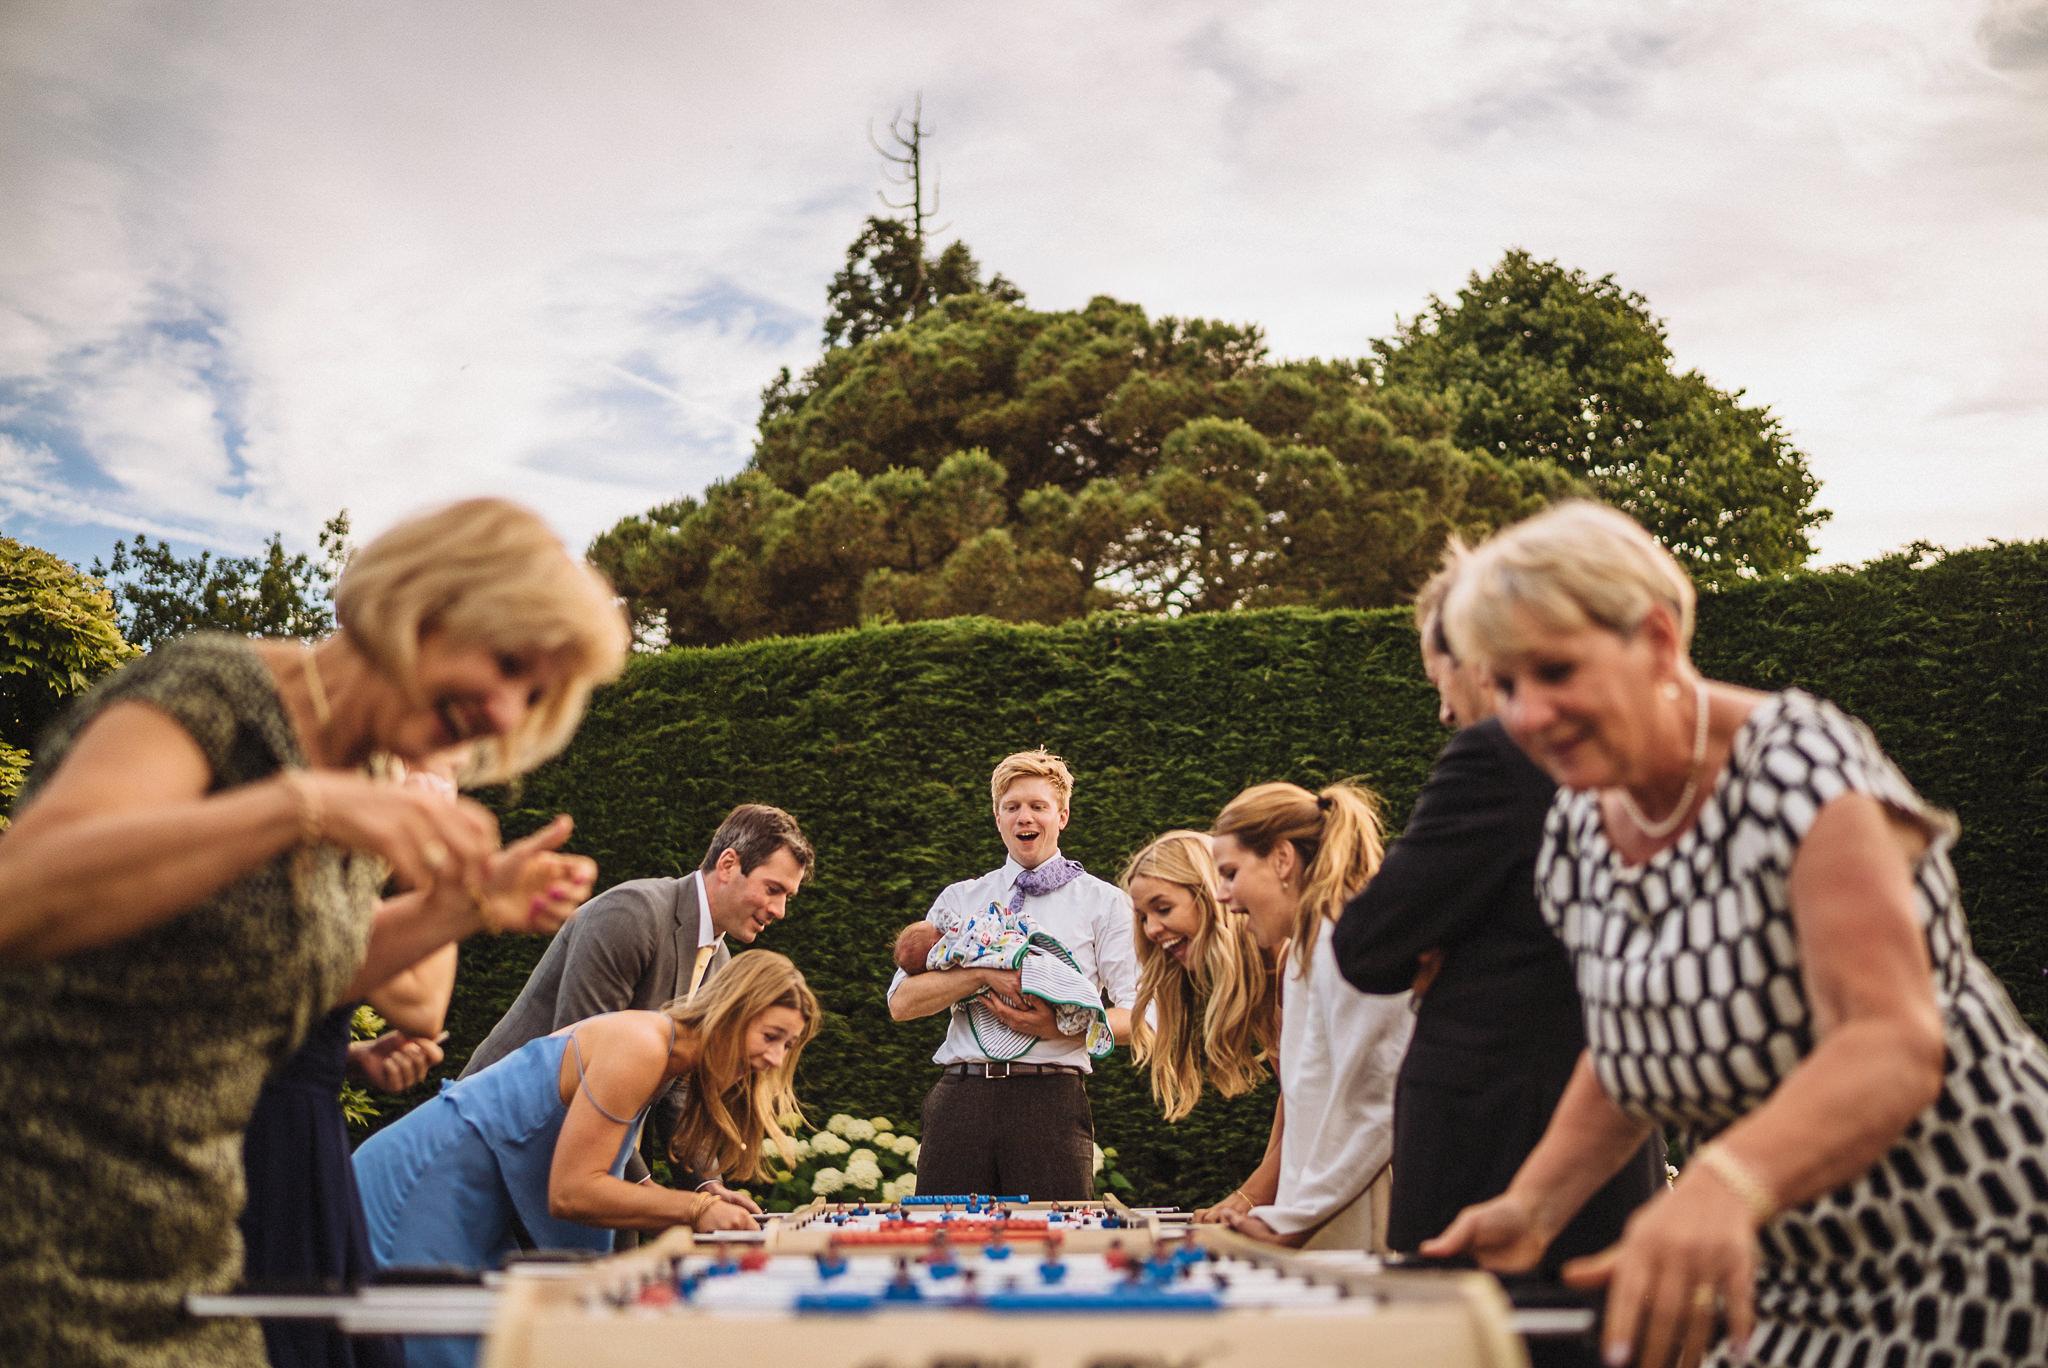 paul-marbrook-Gaynes-Park Wedding-Photographer-90124